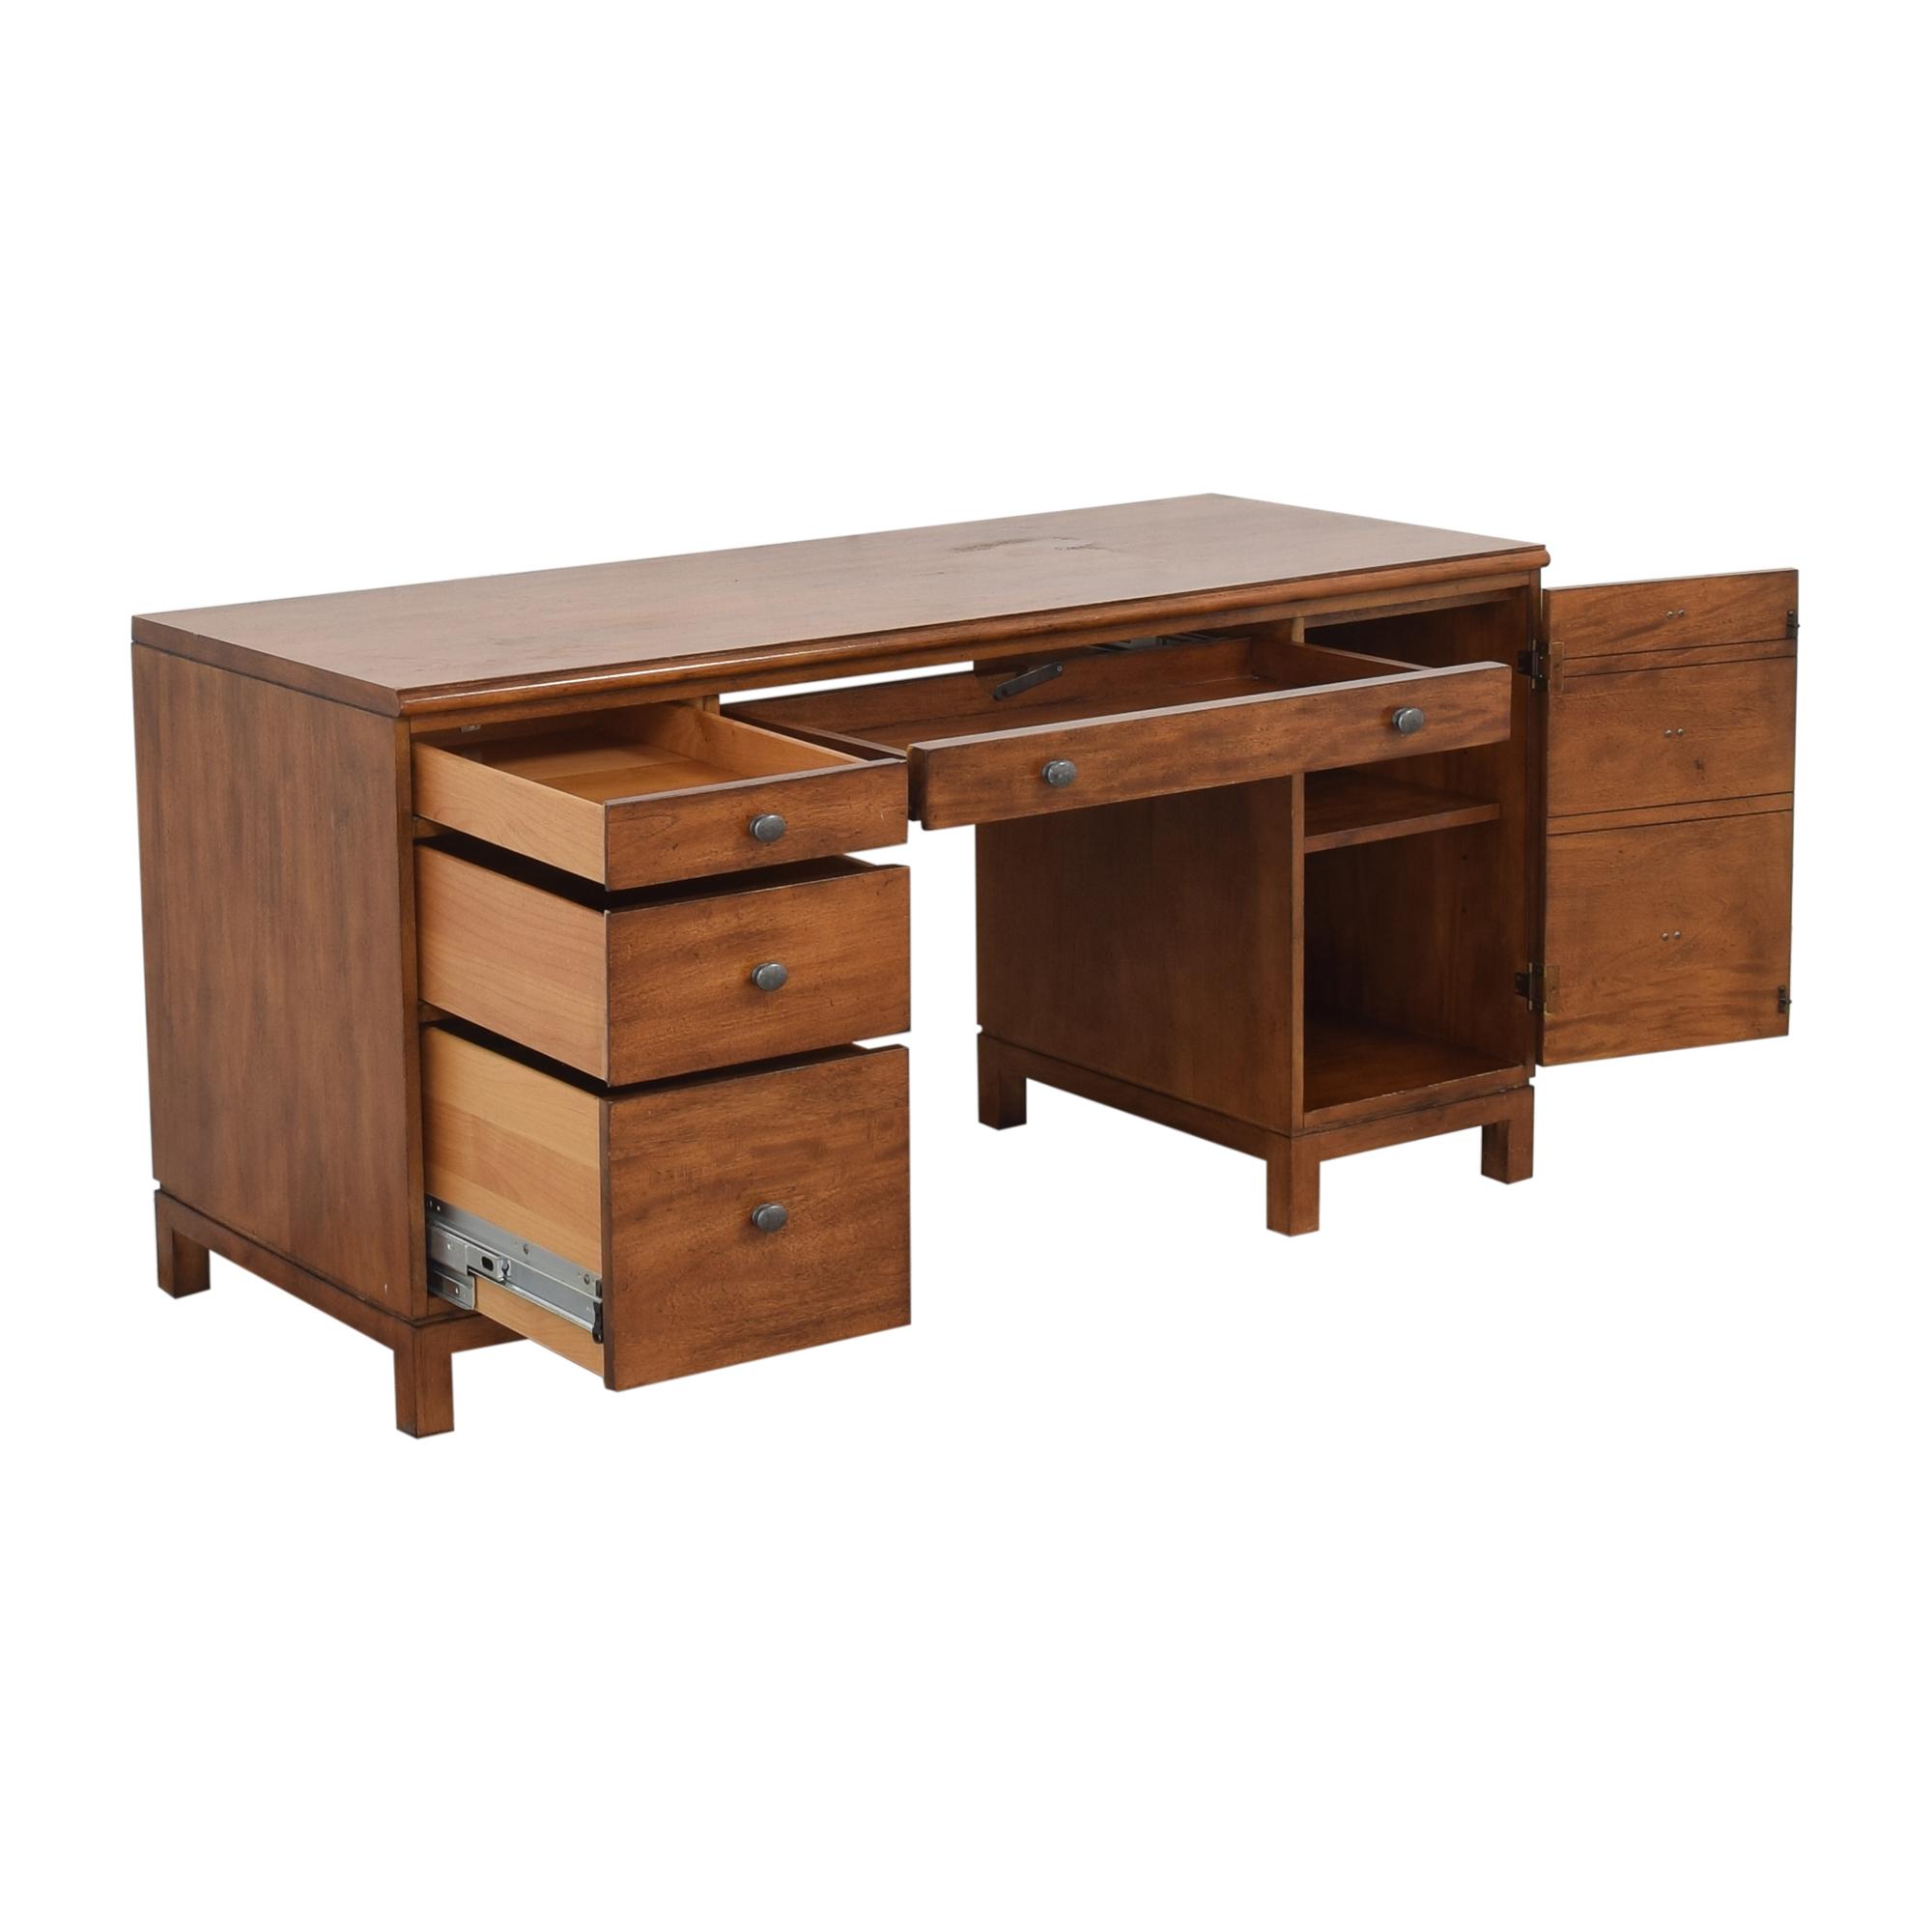 buy Ethan Allen Hawke Double Pedestal Desk Ethan Allen Home Office Desks